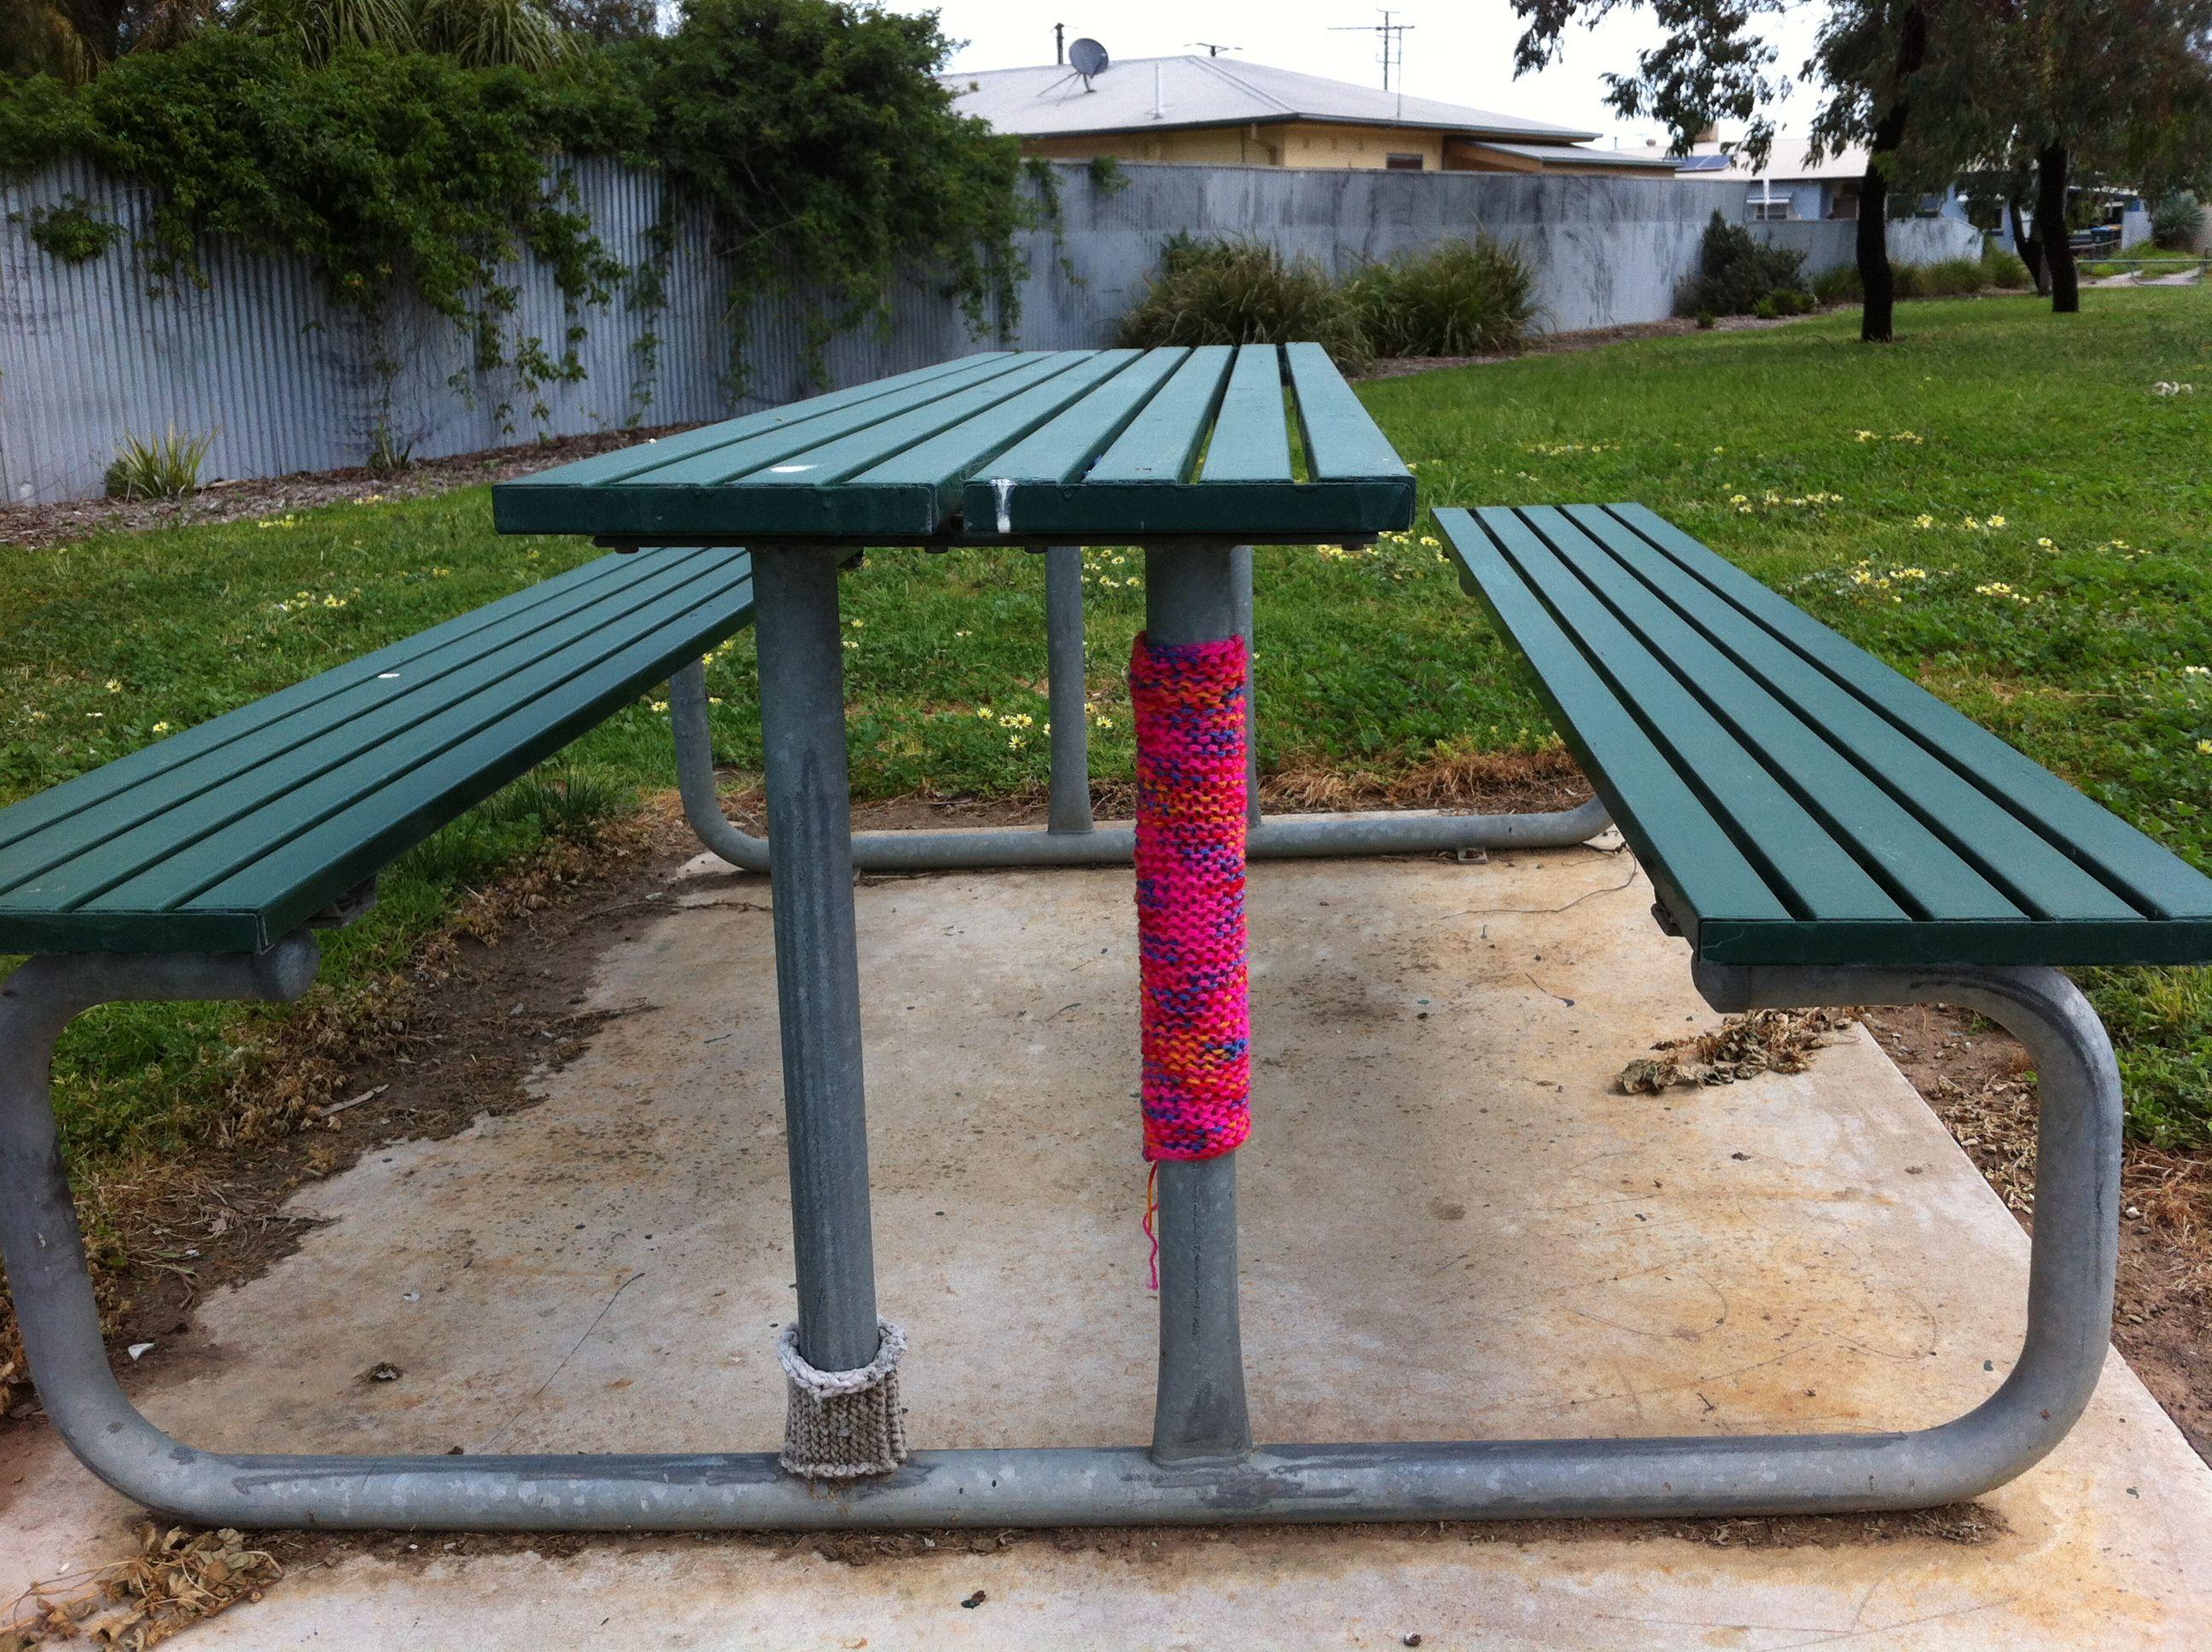 yarn bombing bench - photo #13